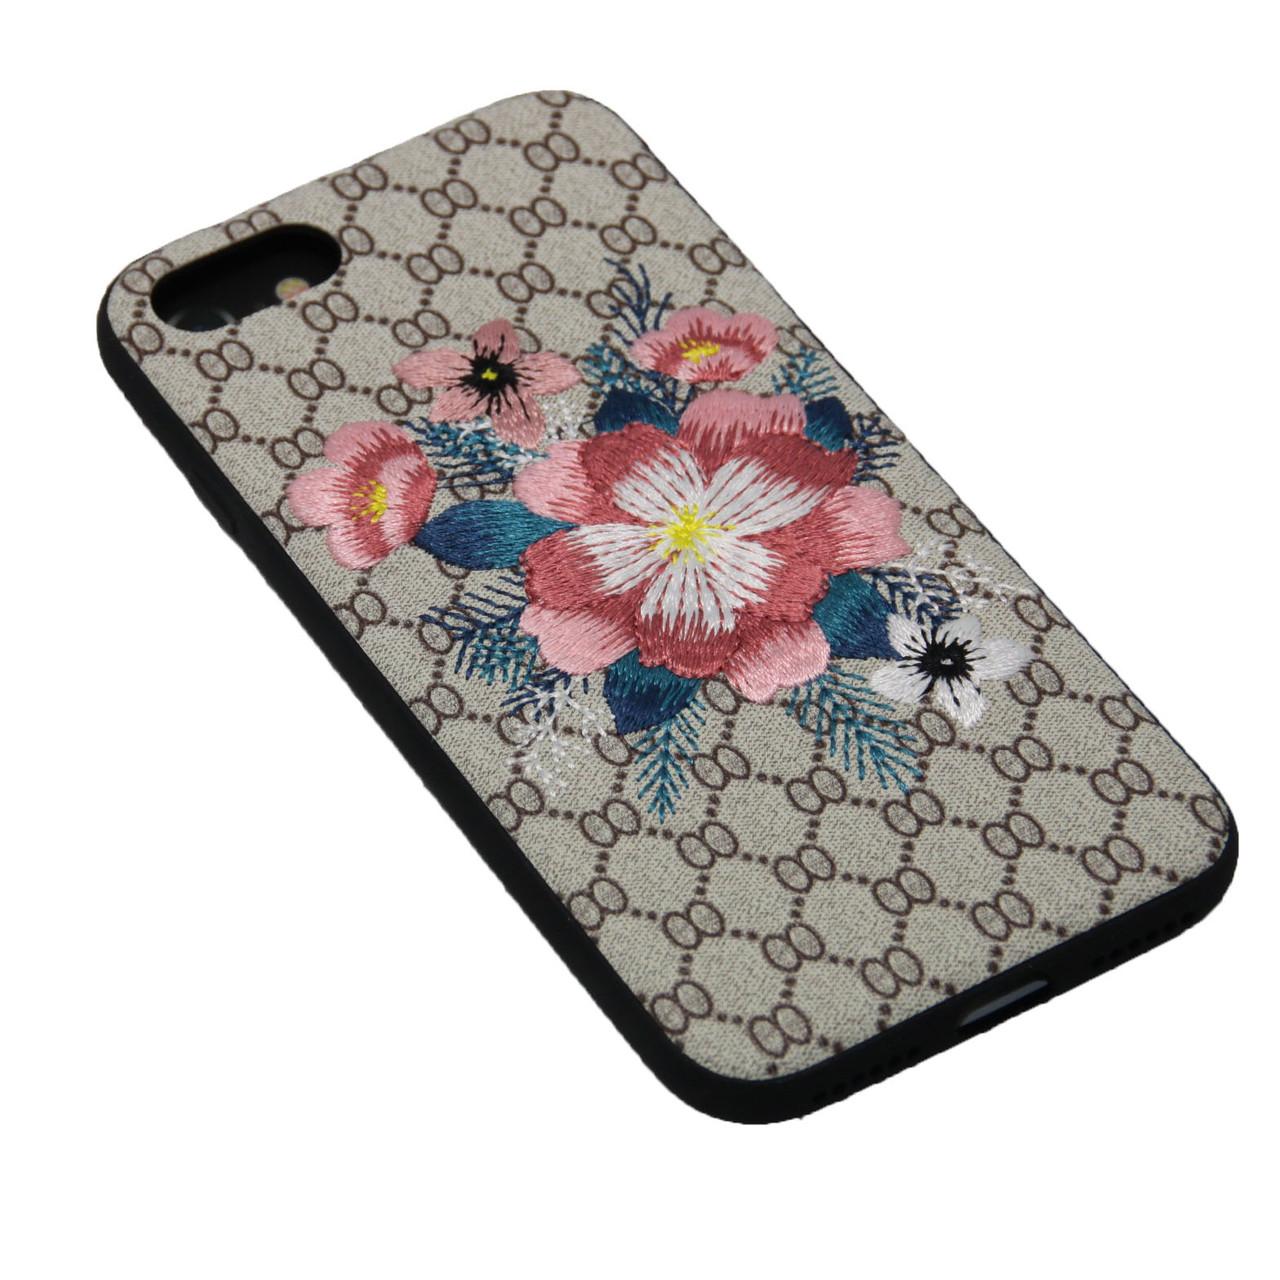 Чехол WK Embroidery iPhone 7 - фото 1